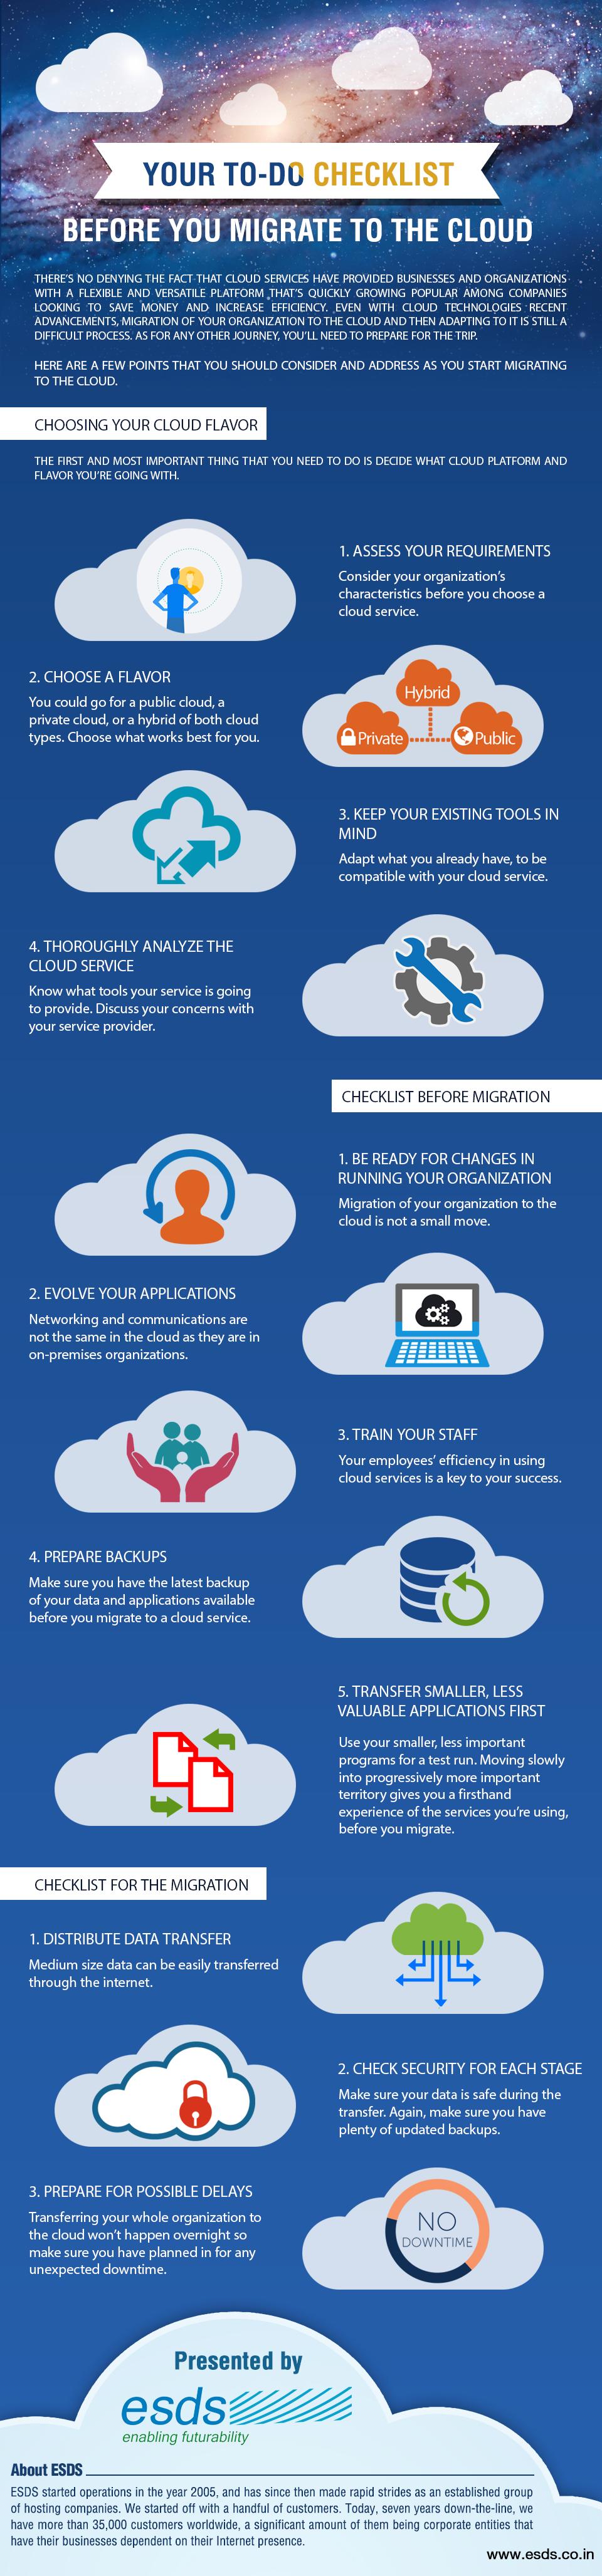 migrating-enterprise-data-to-the-cloud-a-checklist